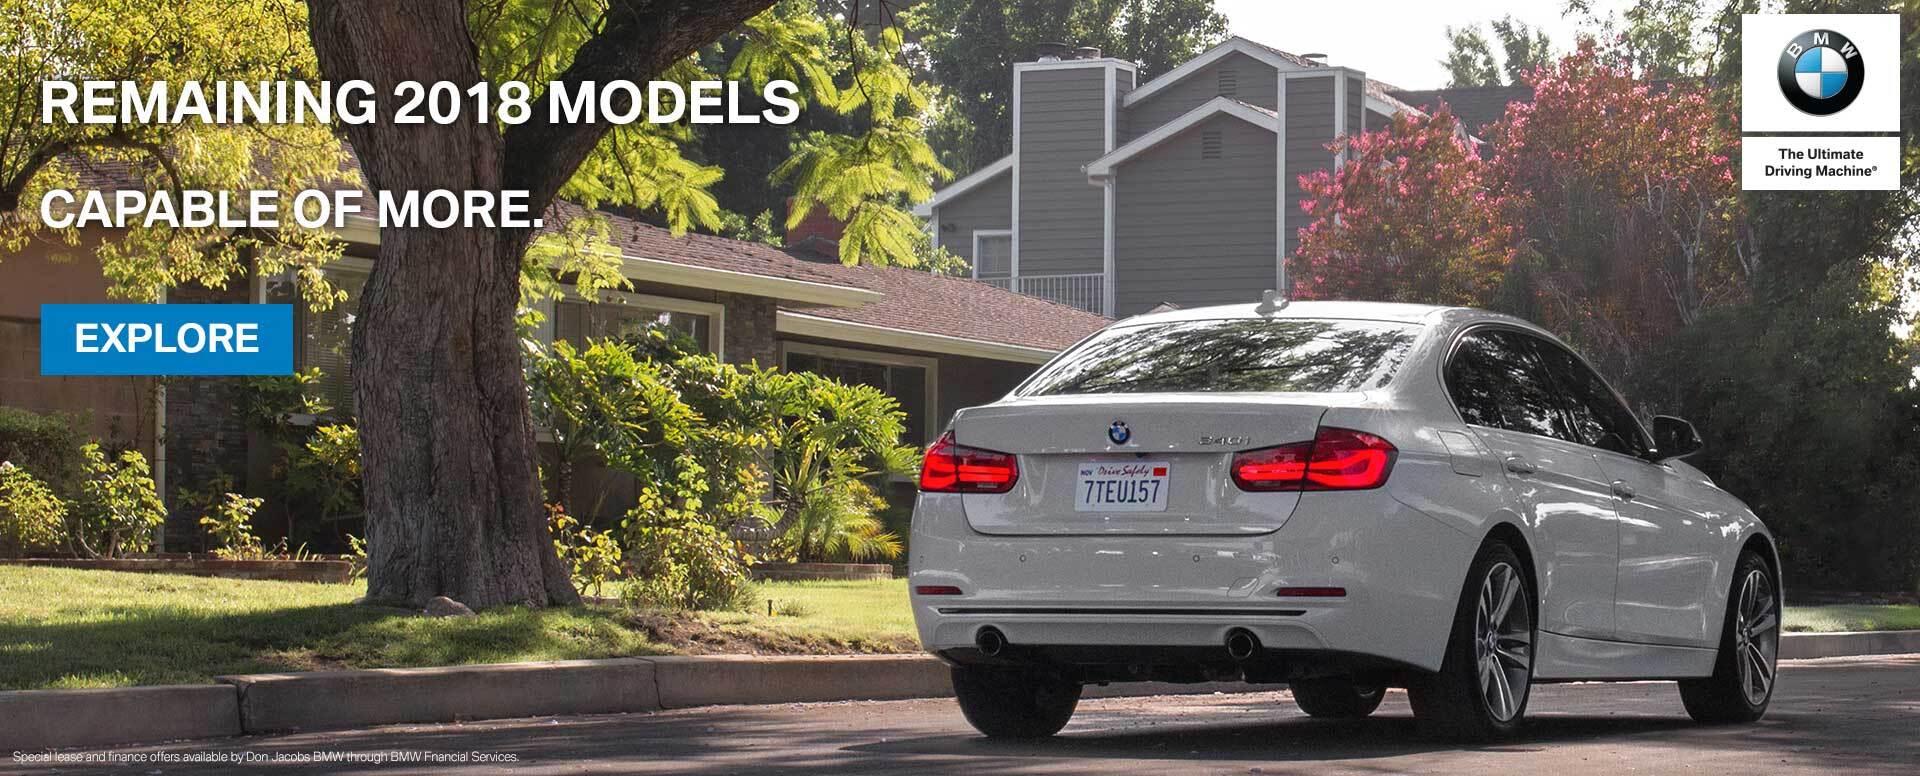 Lexington Car Dealerships: BMW Dealership Lexington KY